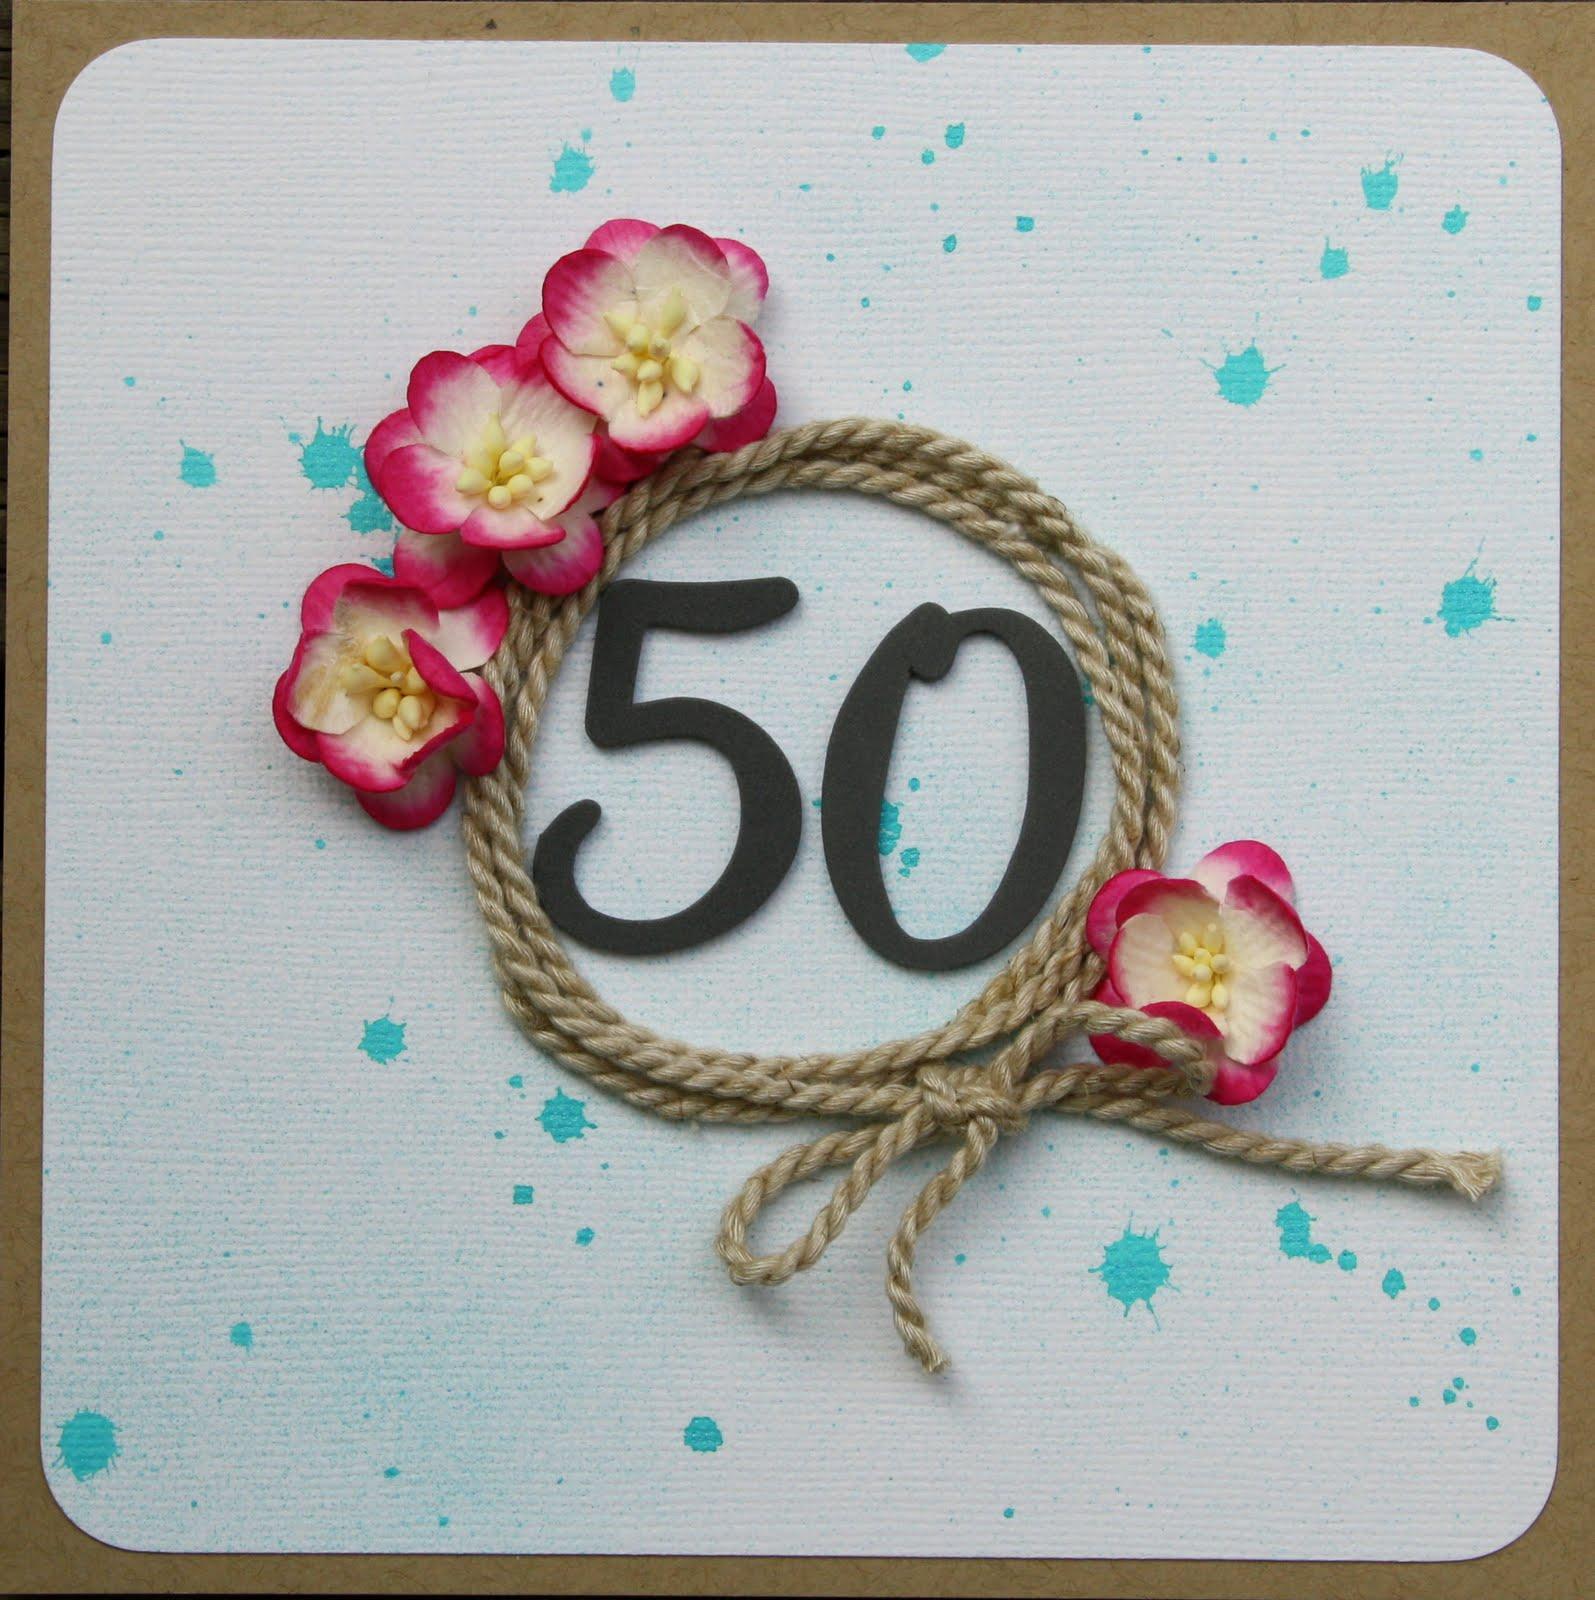 50 års kort Sara Kronqvist   Saras pysselblogg: 50 års kort 50 års kort